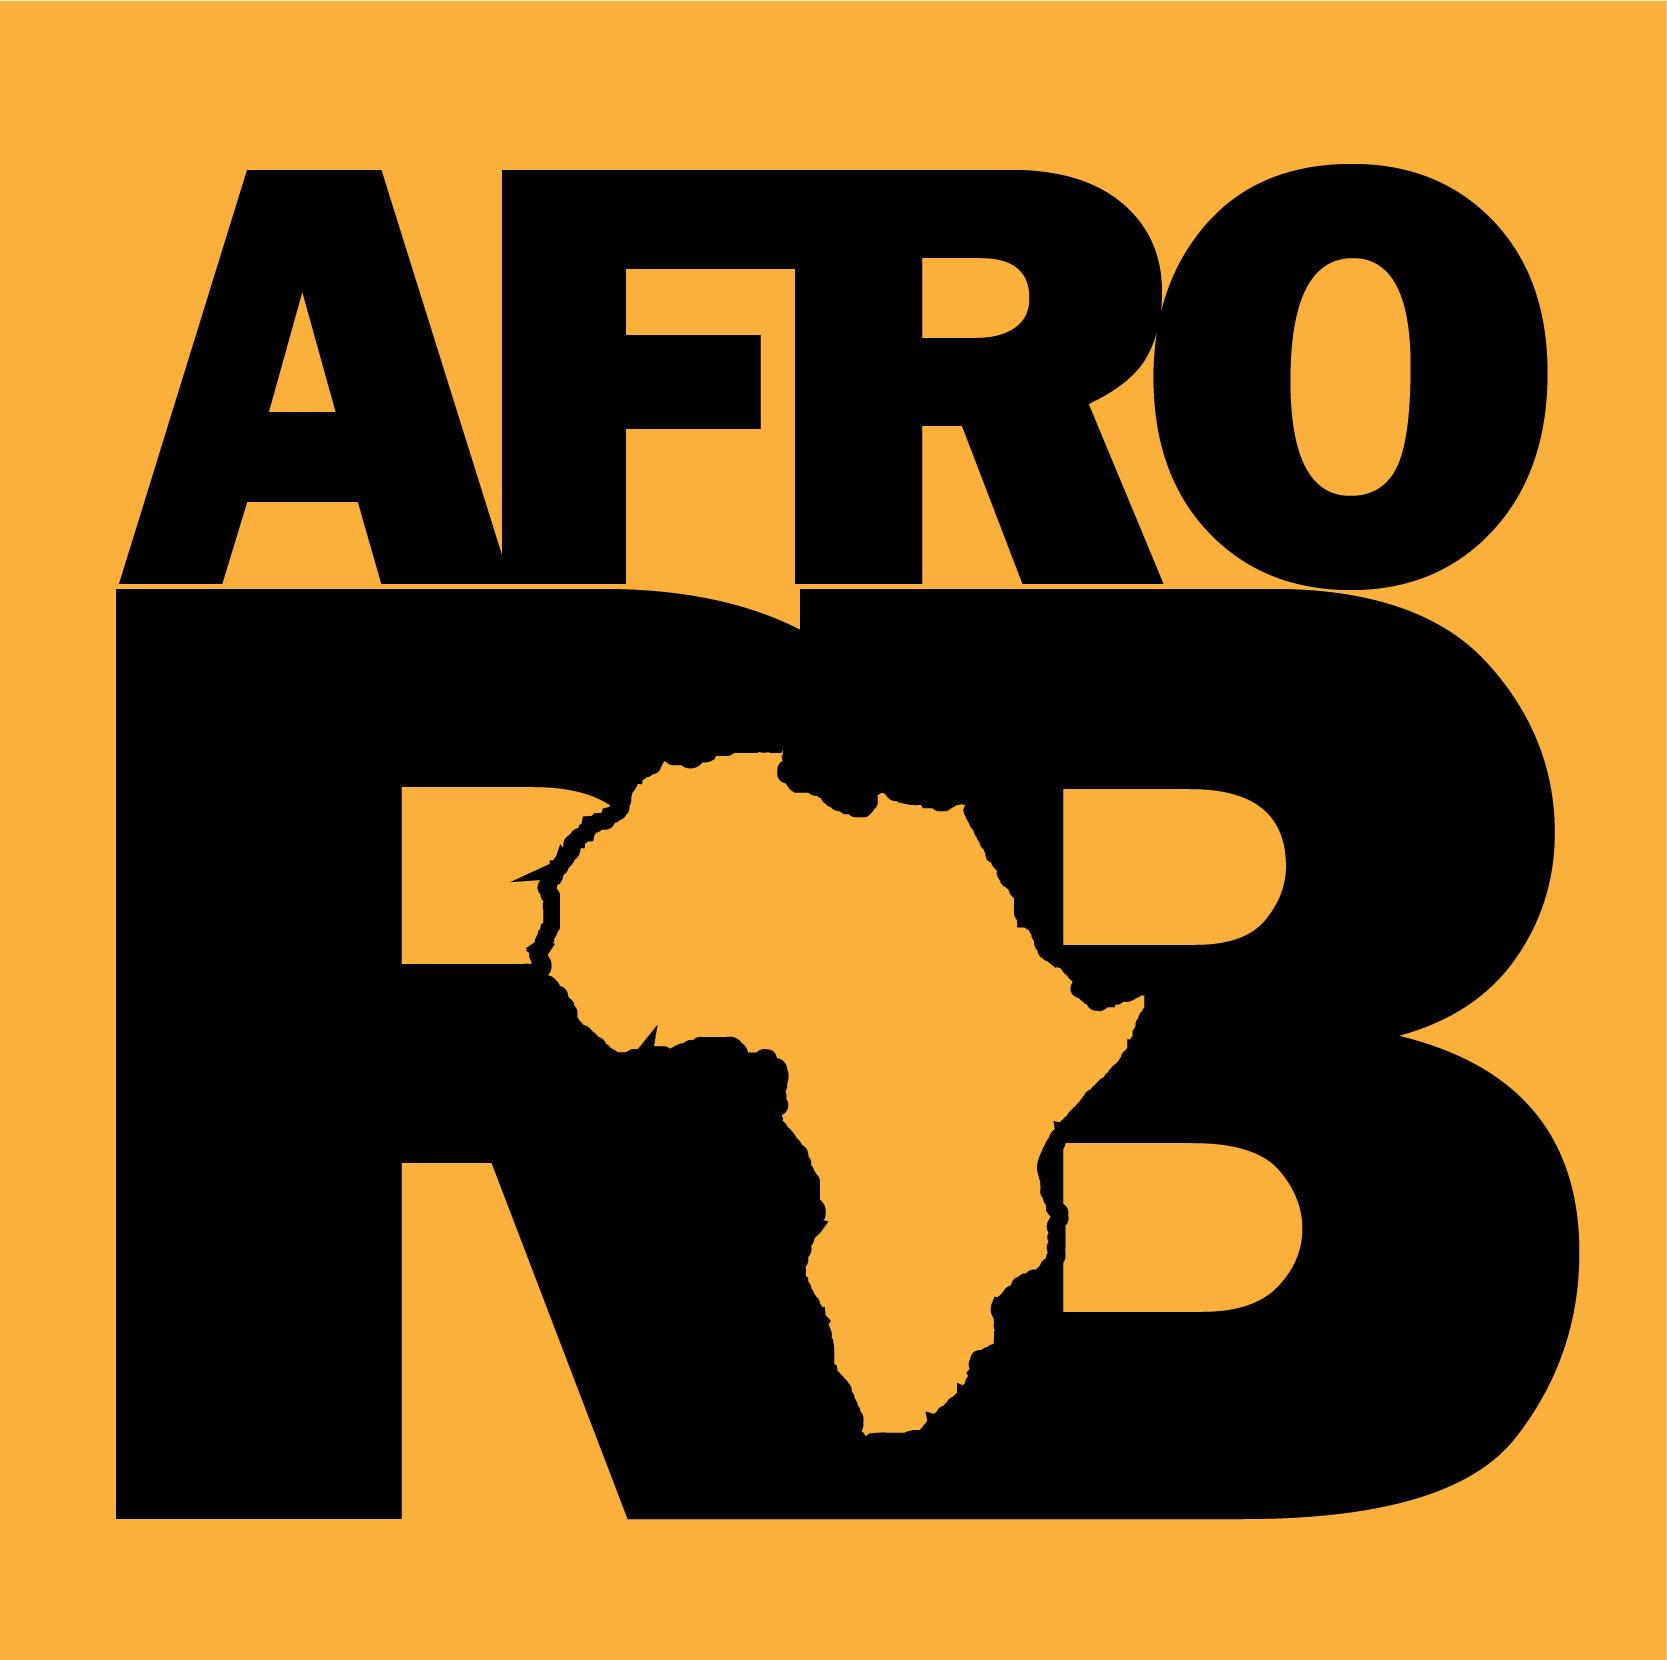 Afro Rhythm & Beats